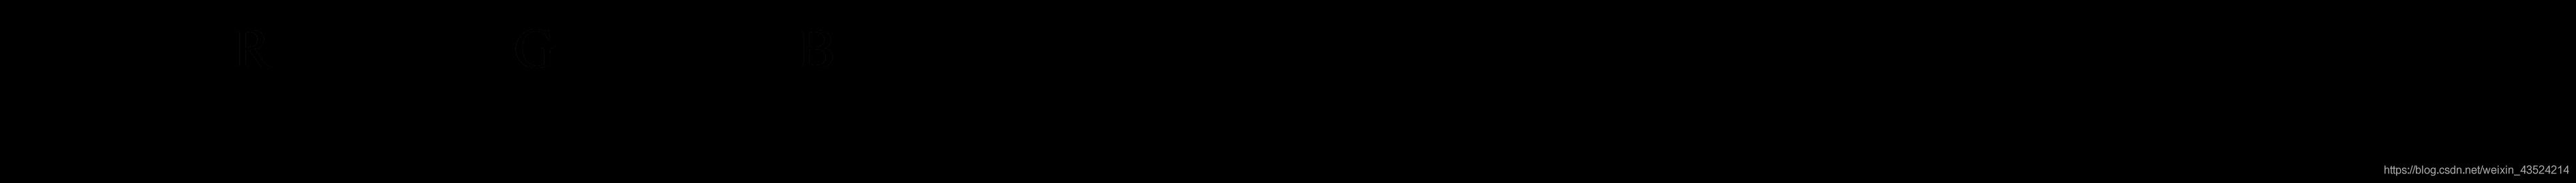 RGB描述